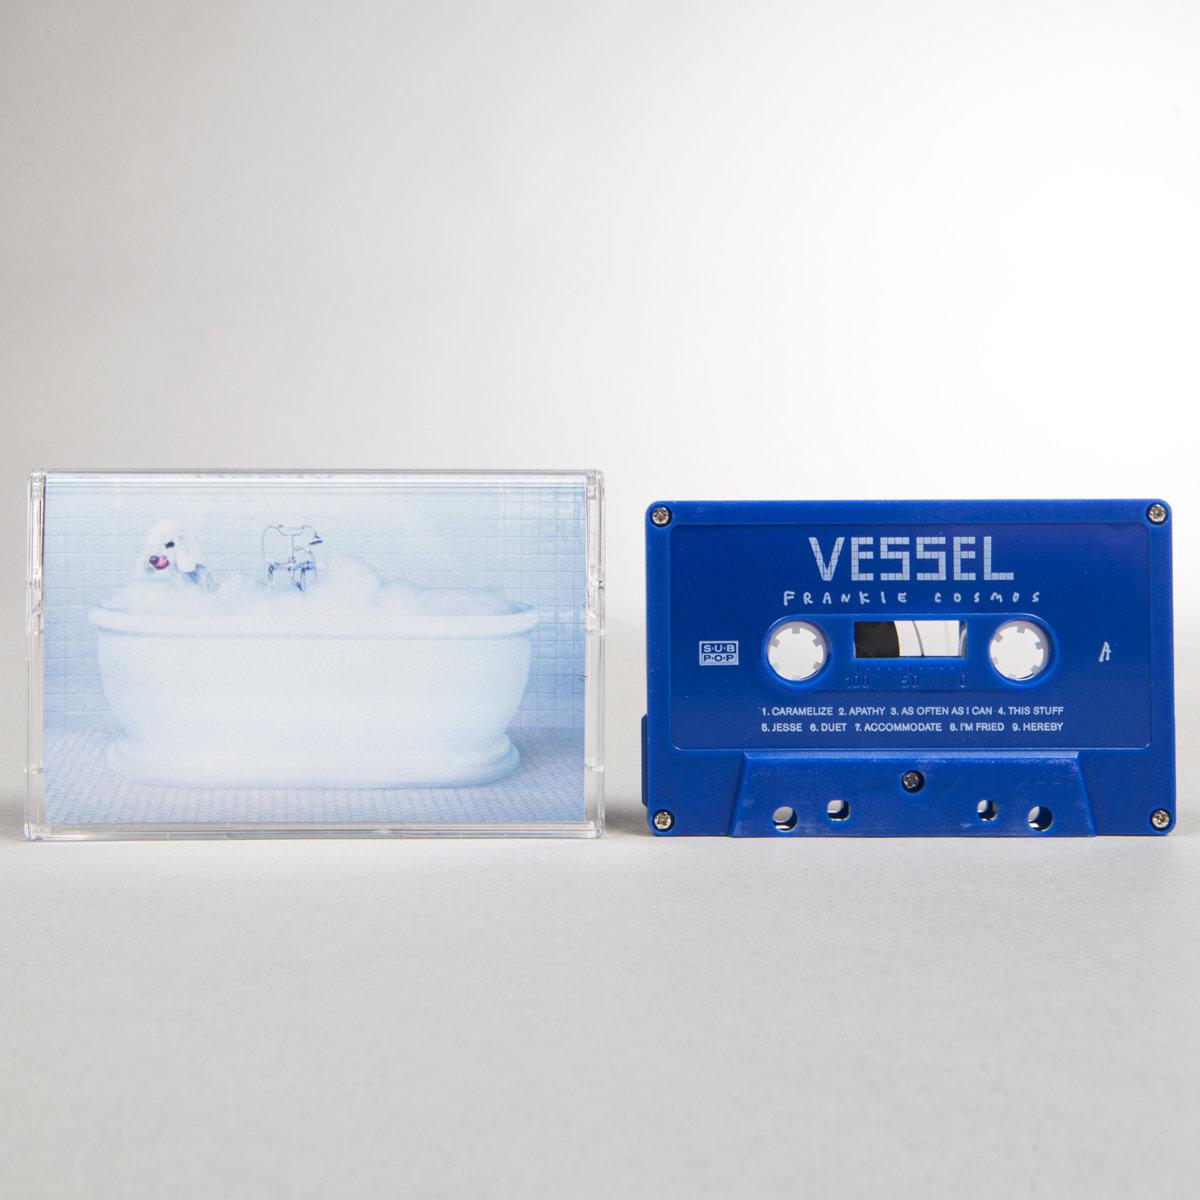 Vessel | Frankie Cosmos